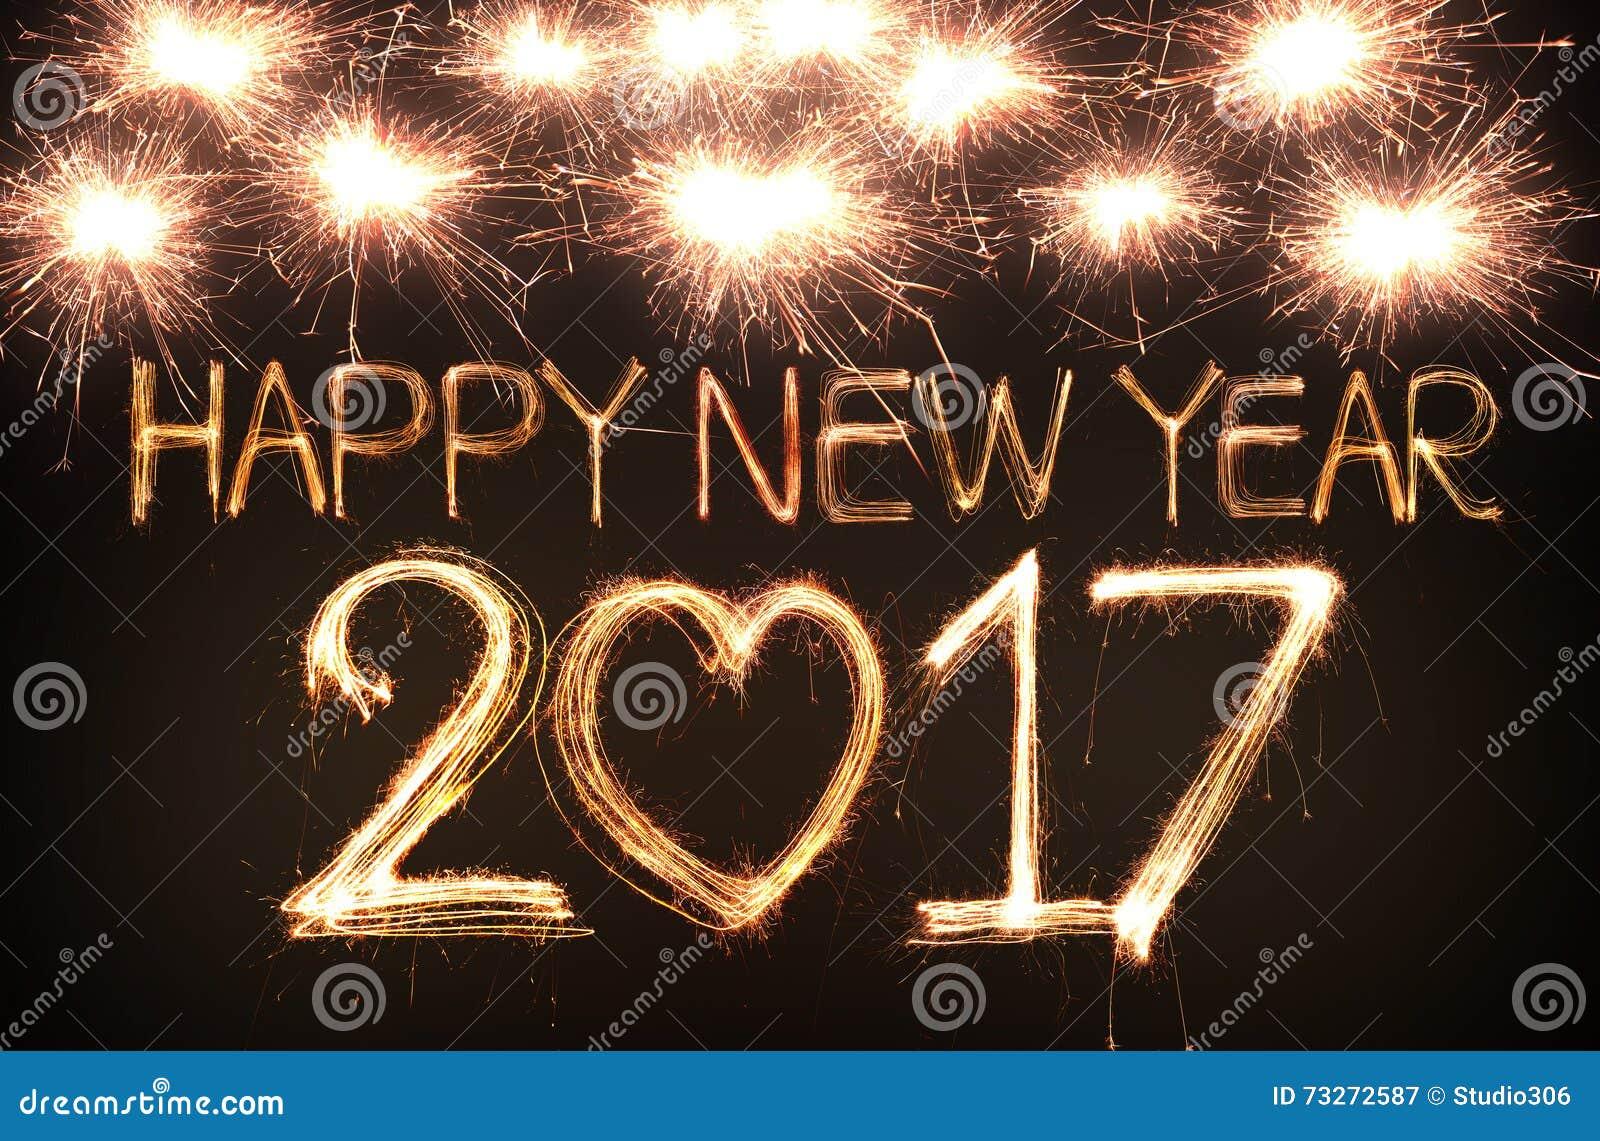 Happy New Year 2017 Stock Illustration Illustration Of Pyrotechnic